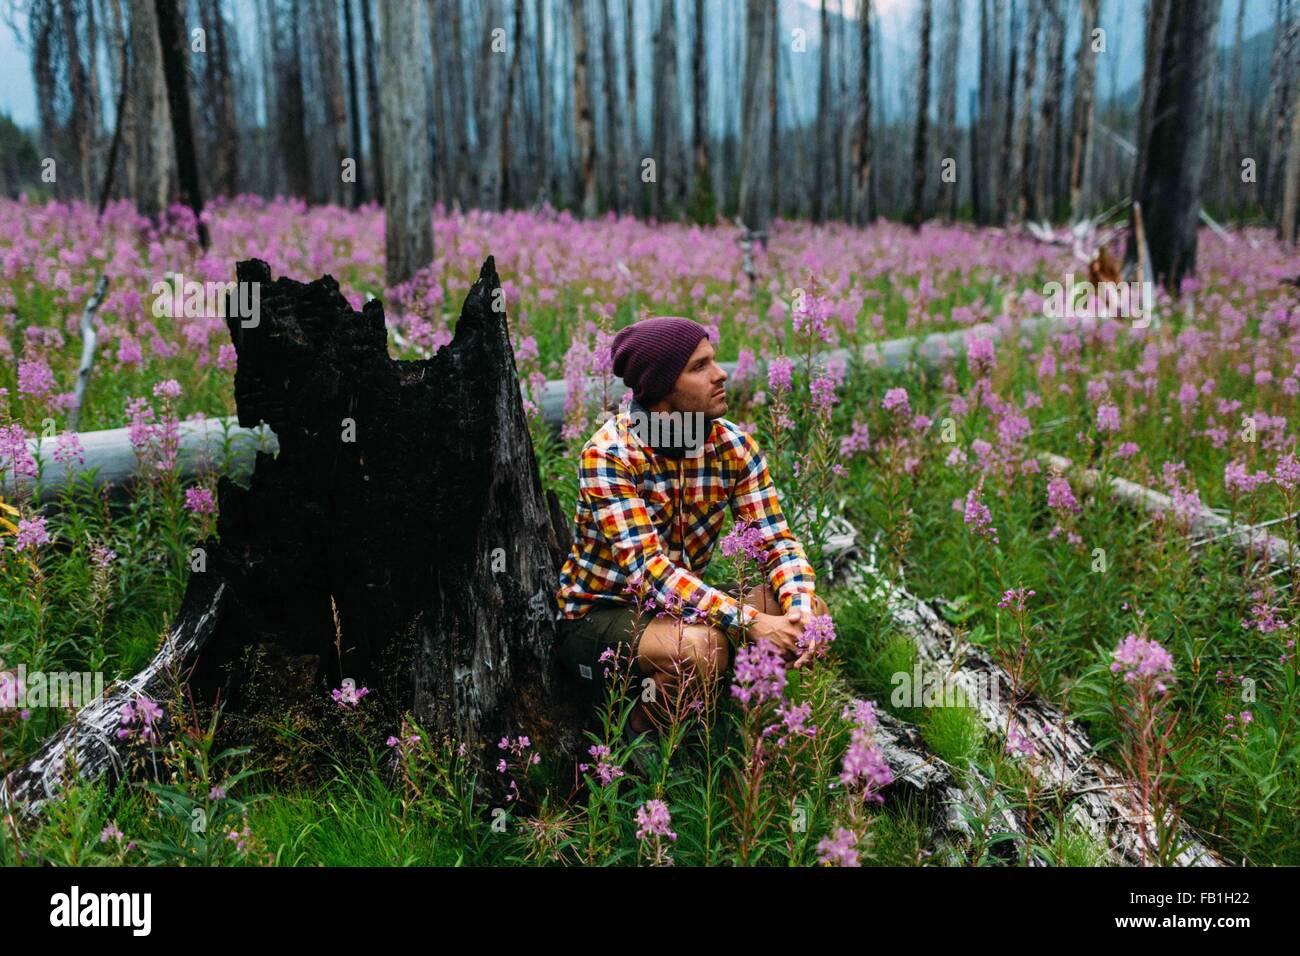 Mid adult man sitting burnt tree stump field wildflowers away Moraine lake Banff National Park Alberta Canada - Stock Image